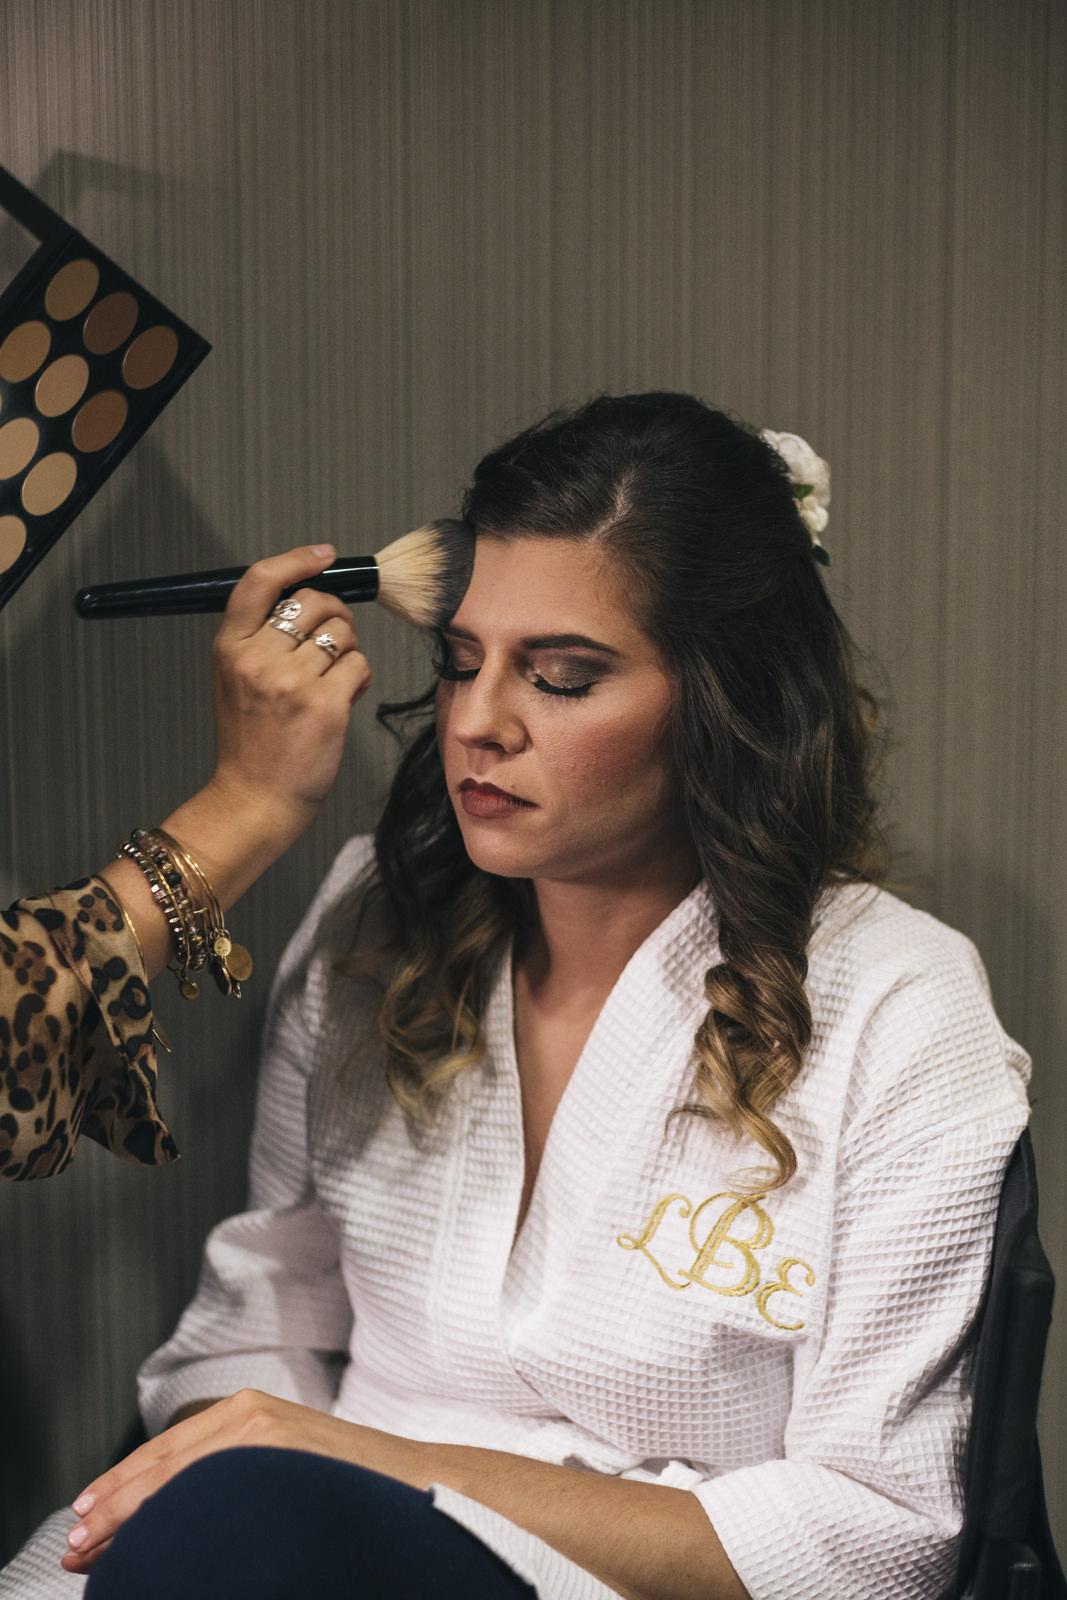 LeeAnn gets her makeup done before her wedding ceremony in Toledo, Ohio.